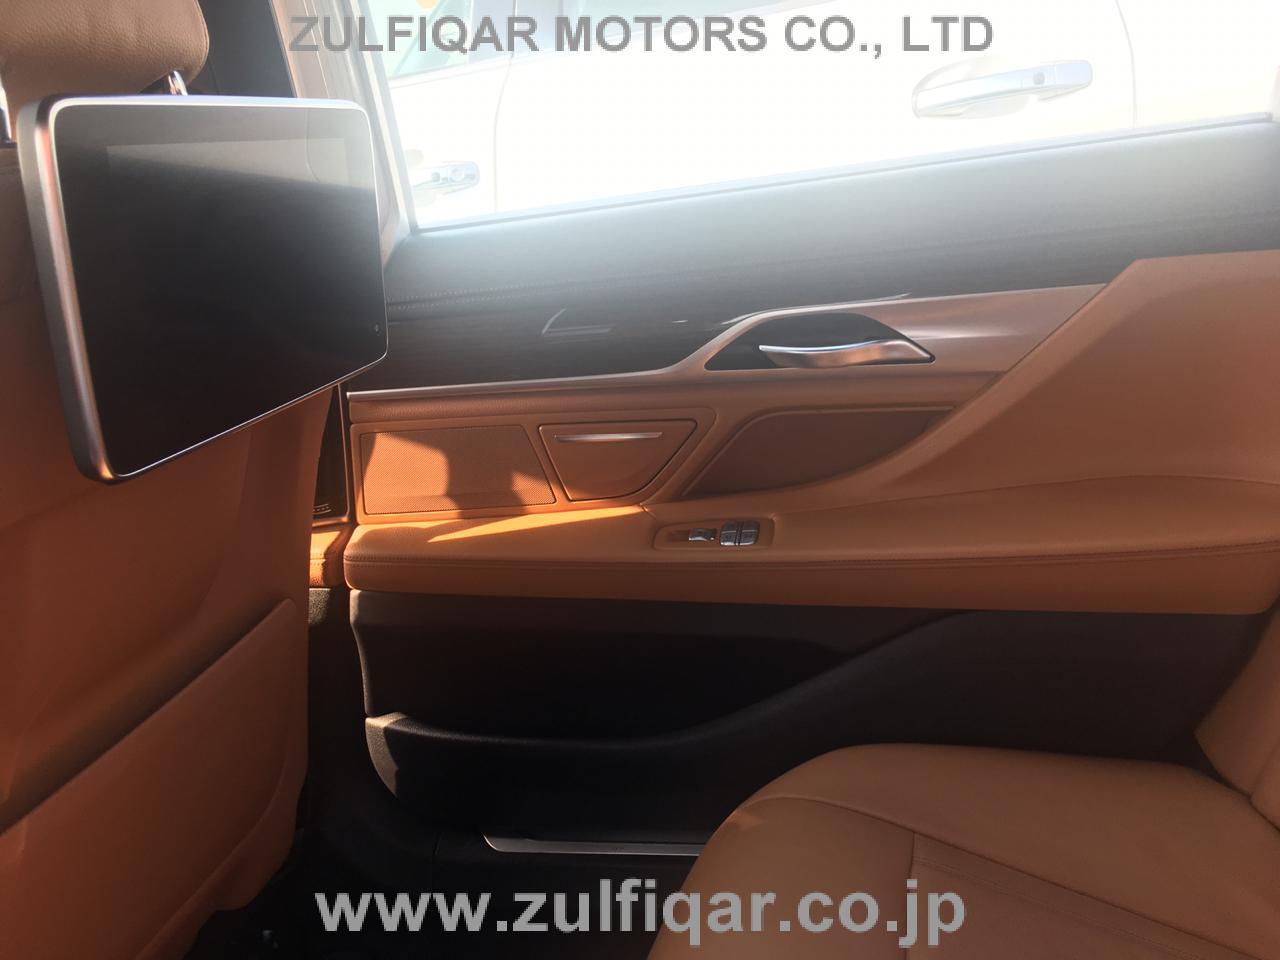 BMW 7 SERIES 2017 Image 8